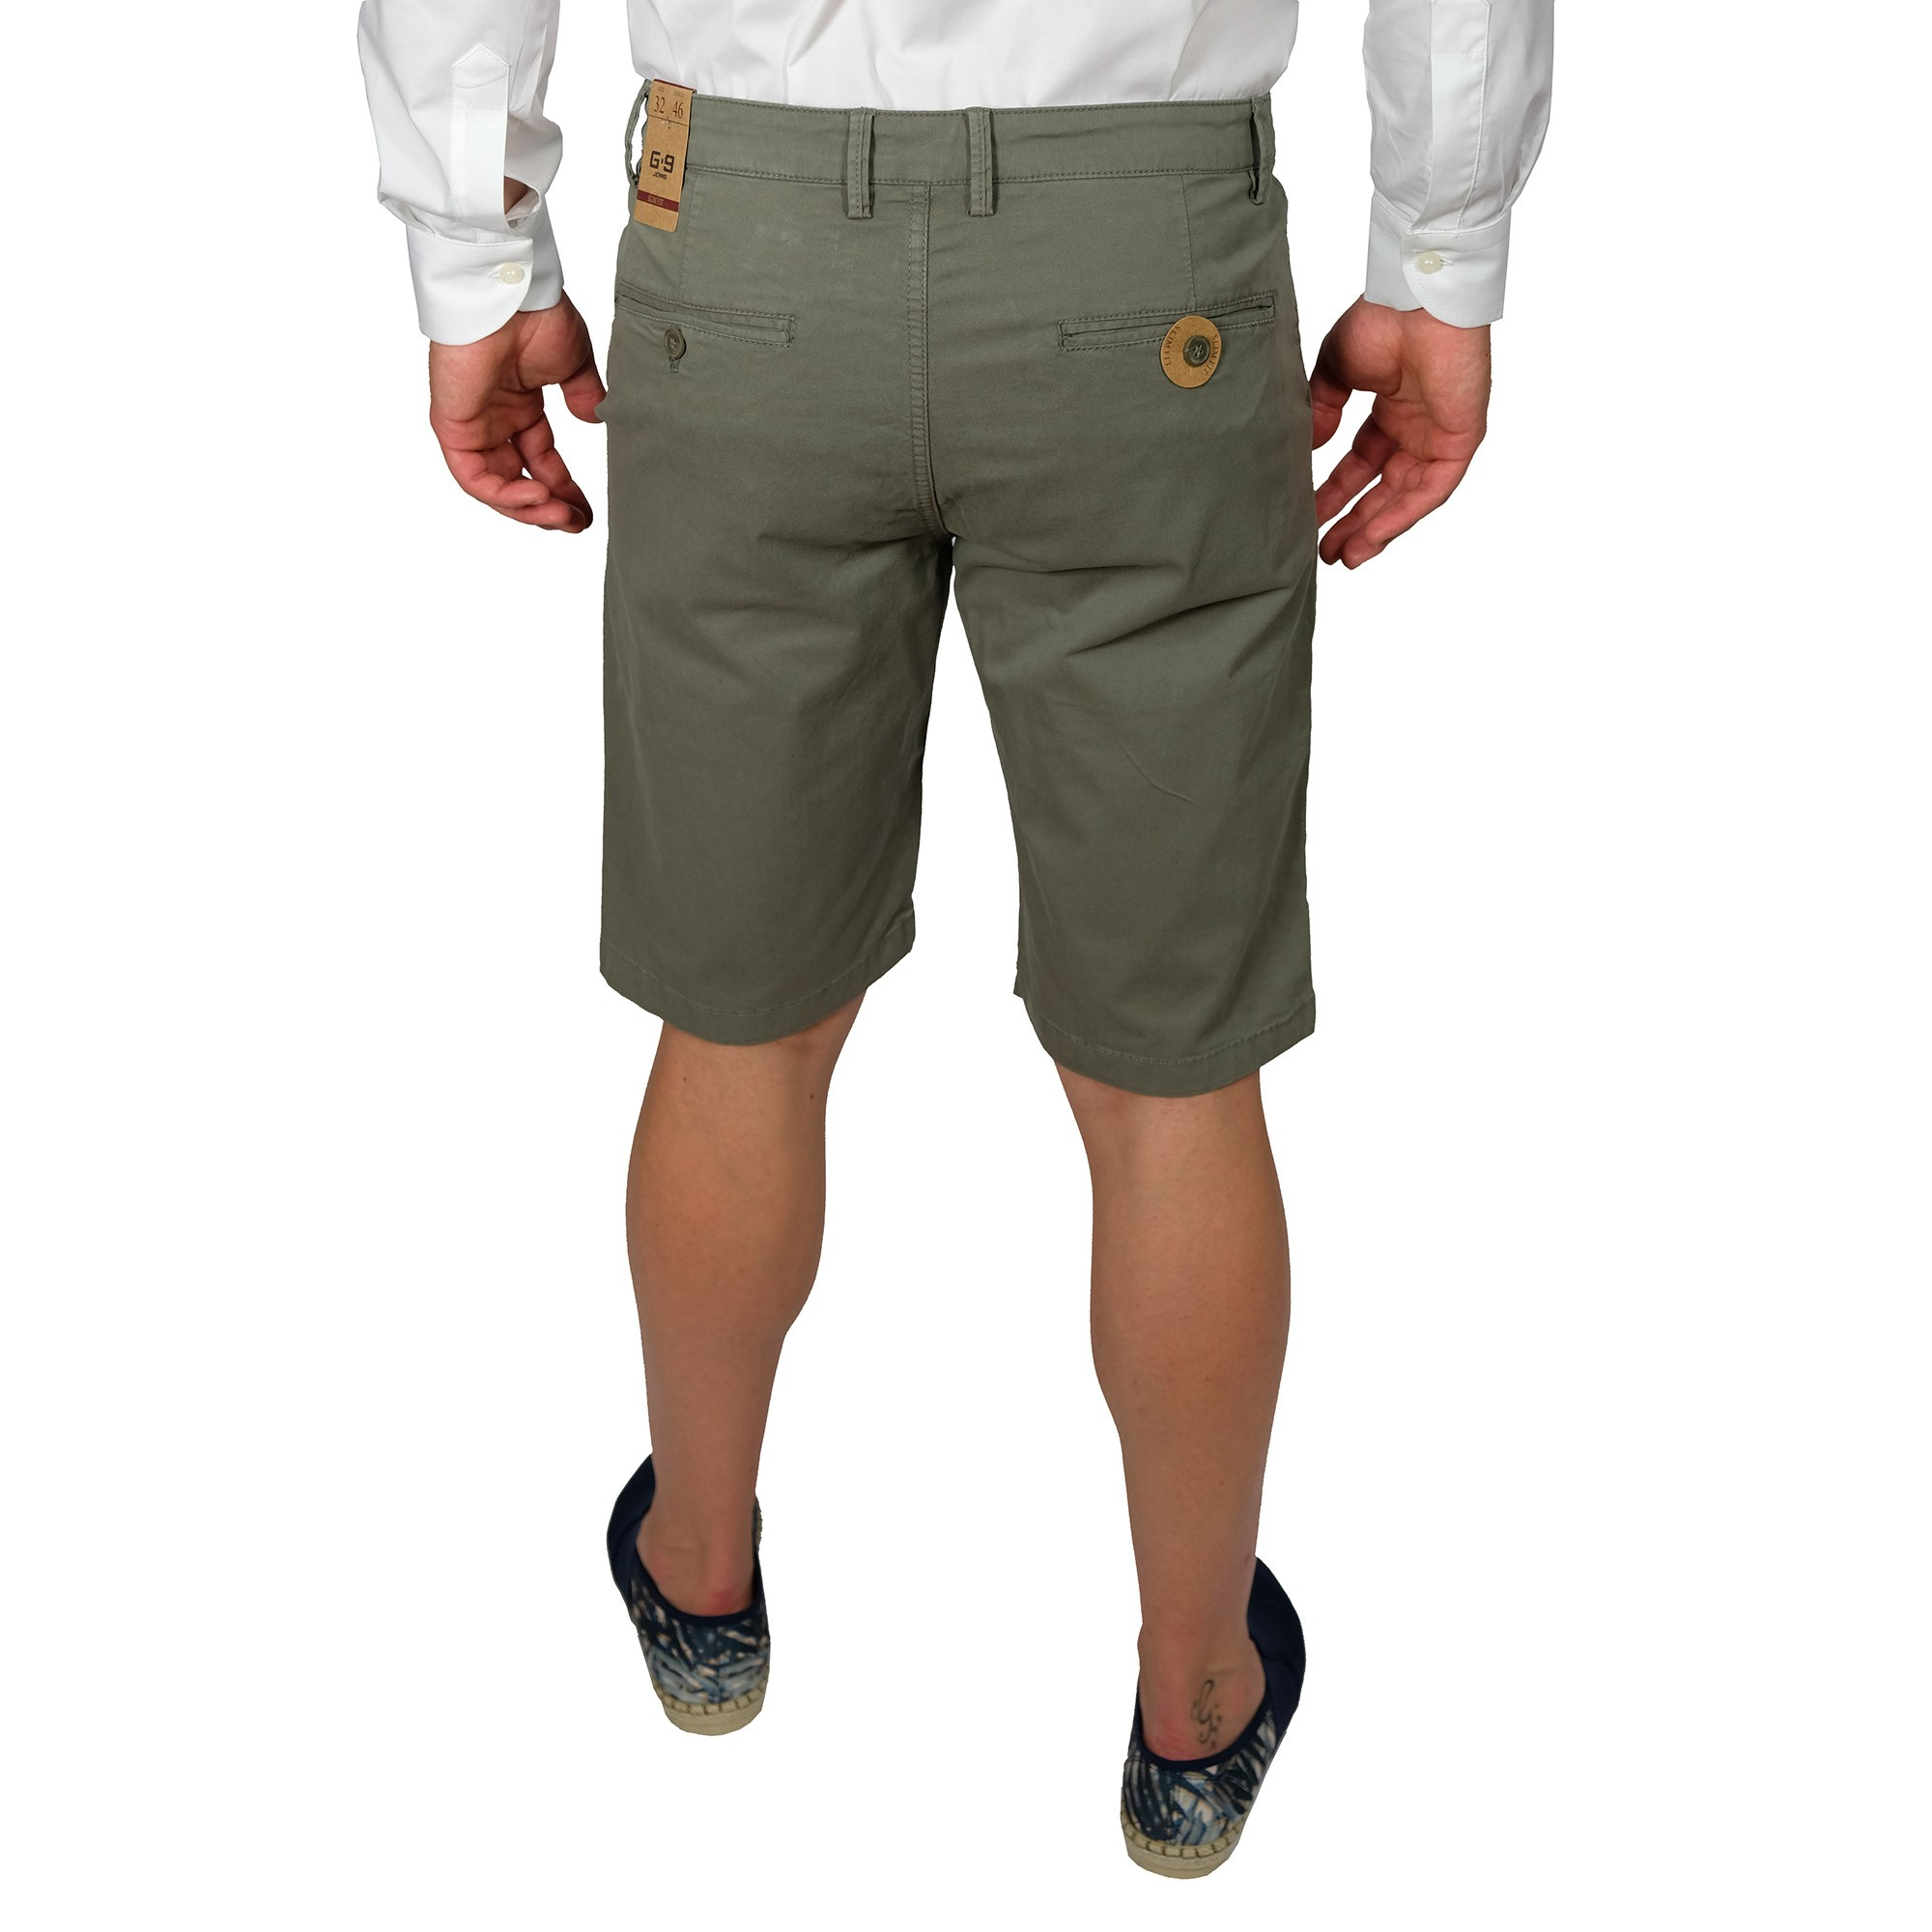 Bermuda-Uomo-Cotone-Jeans-Pantaloncini-Pantaloni-Corti-Tasca-America-Slim-Shorts miniatura 10